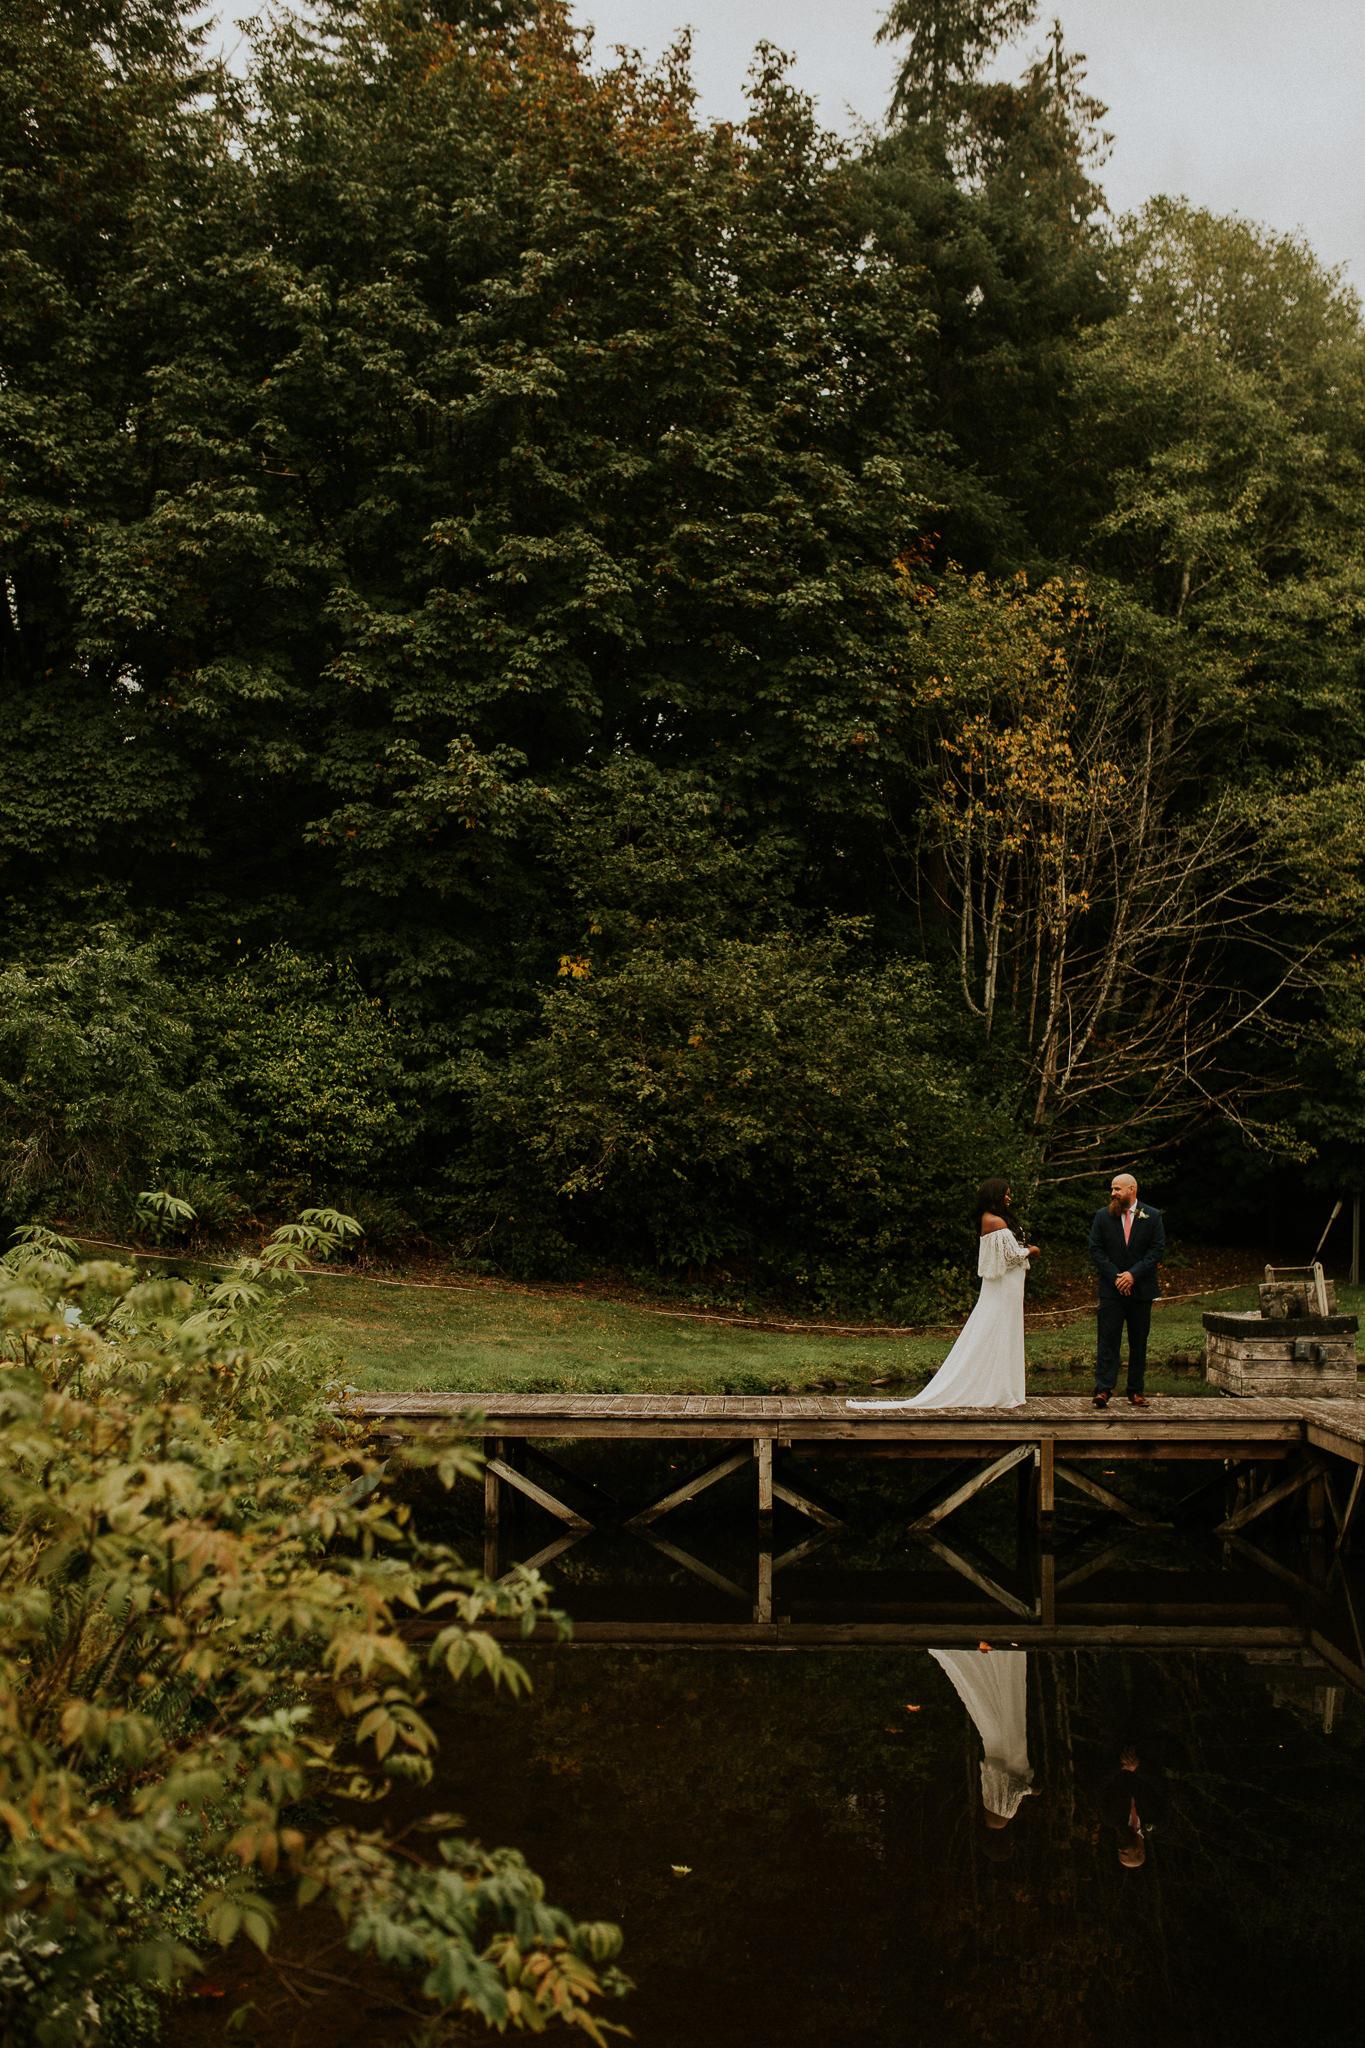 Lakeside-elopement-teasers-8.jpg